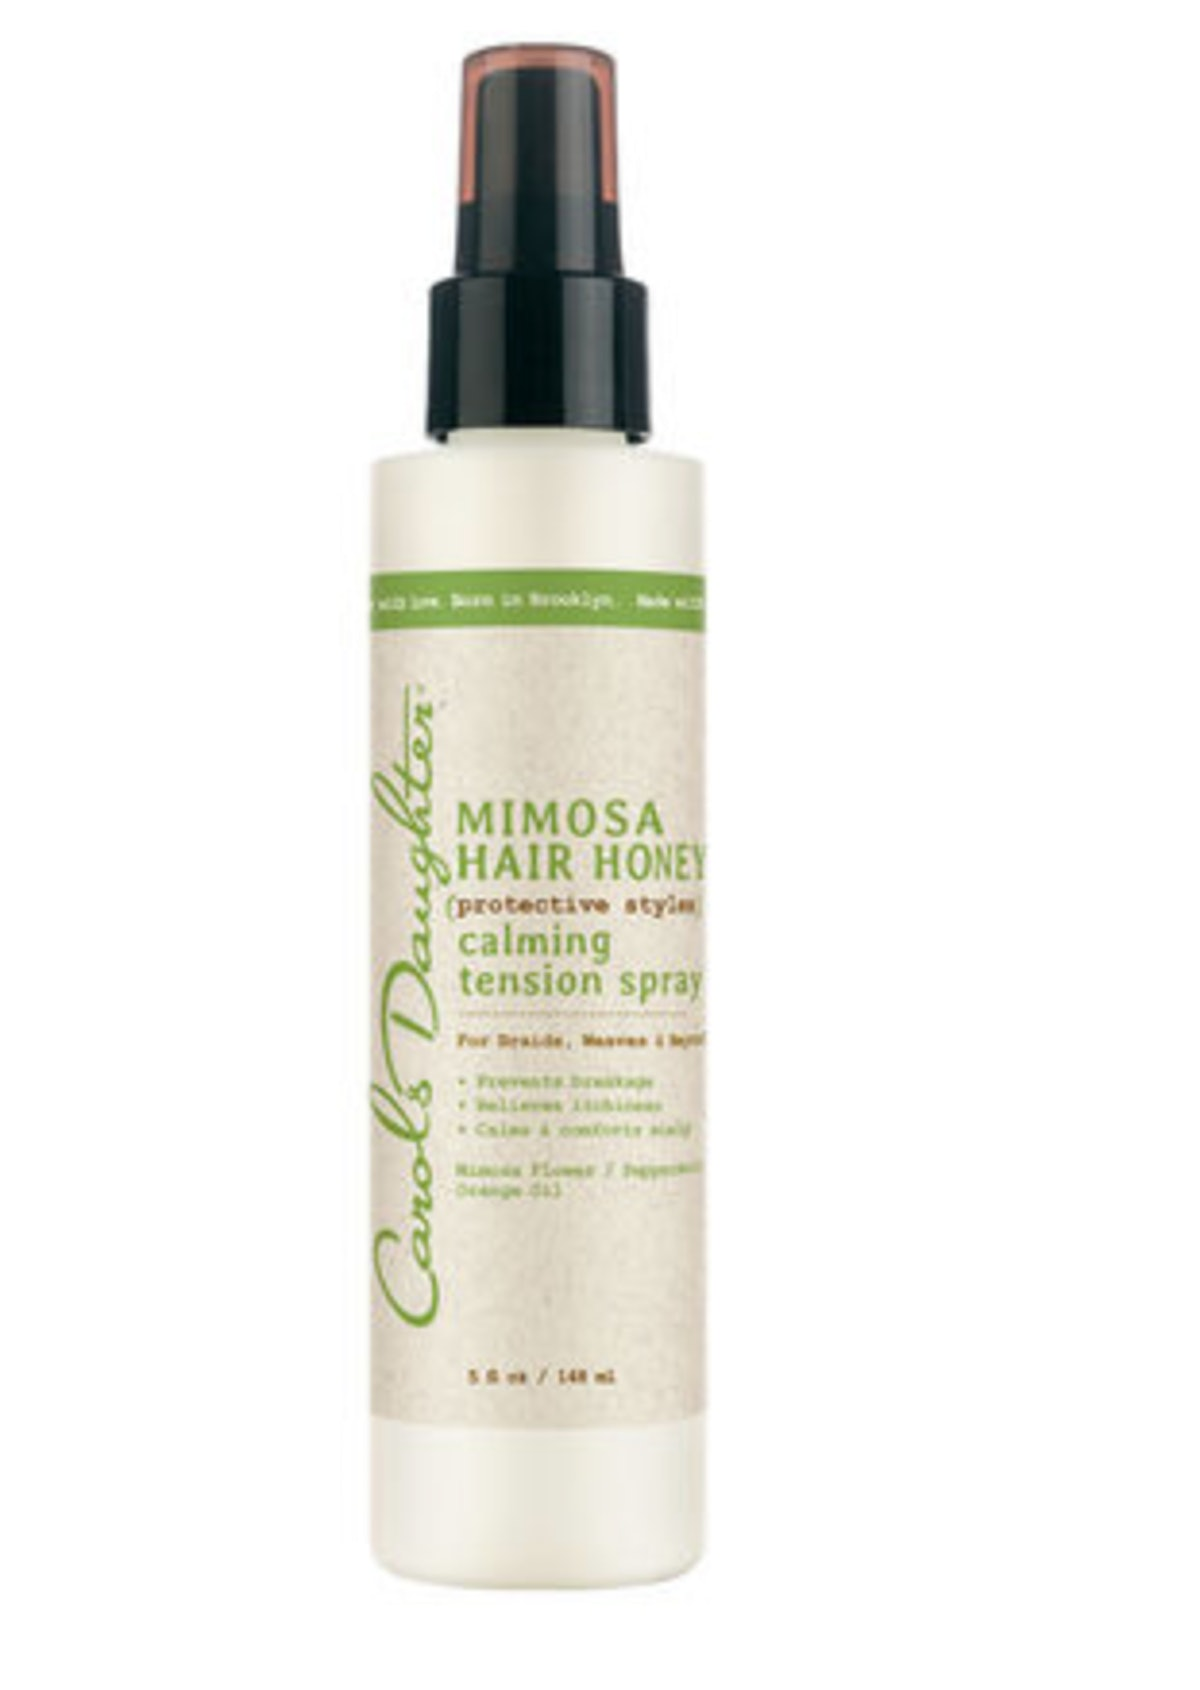 Mimosa Hair Honey Calming Tension Spray